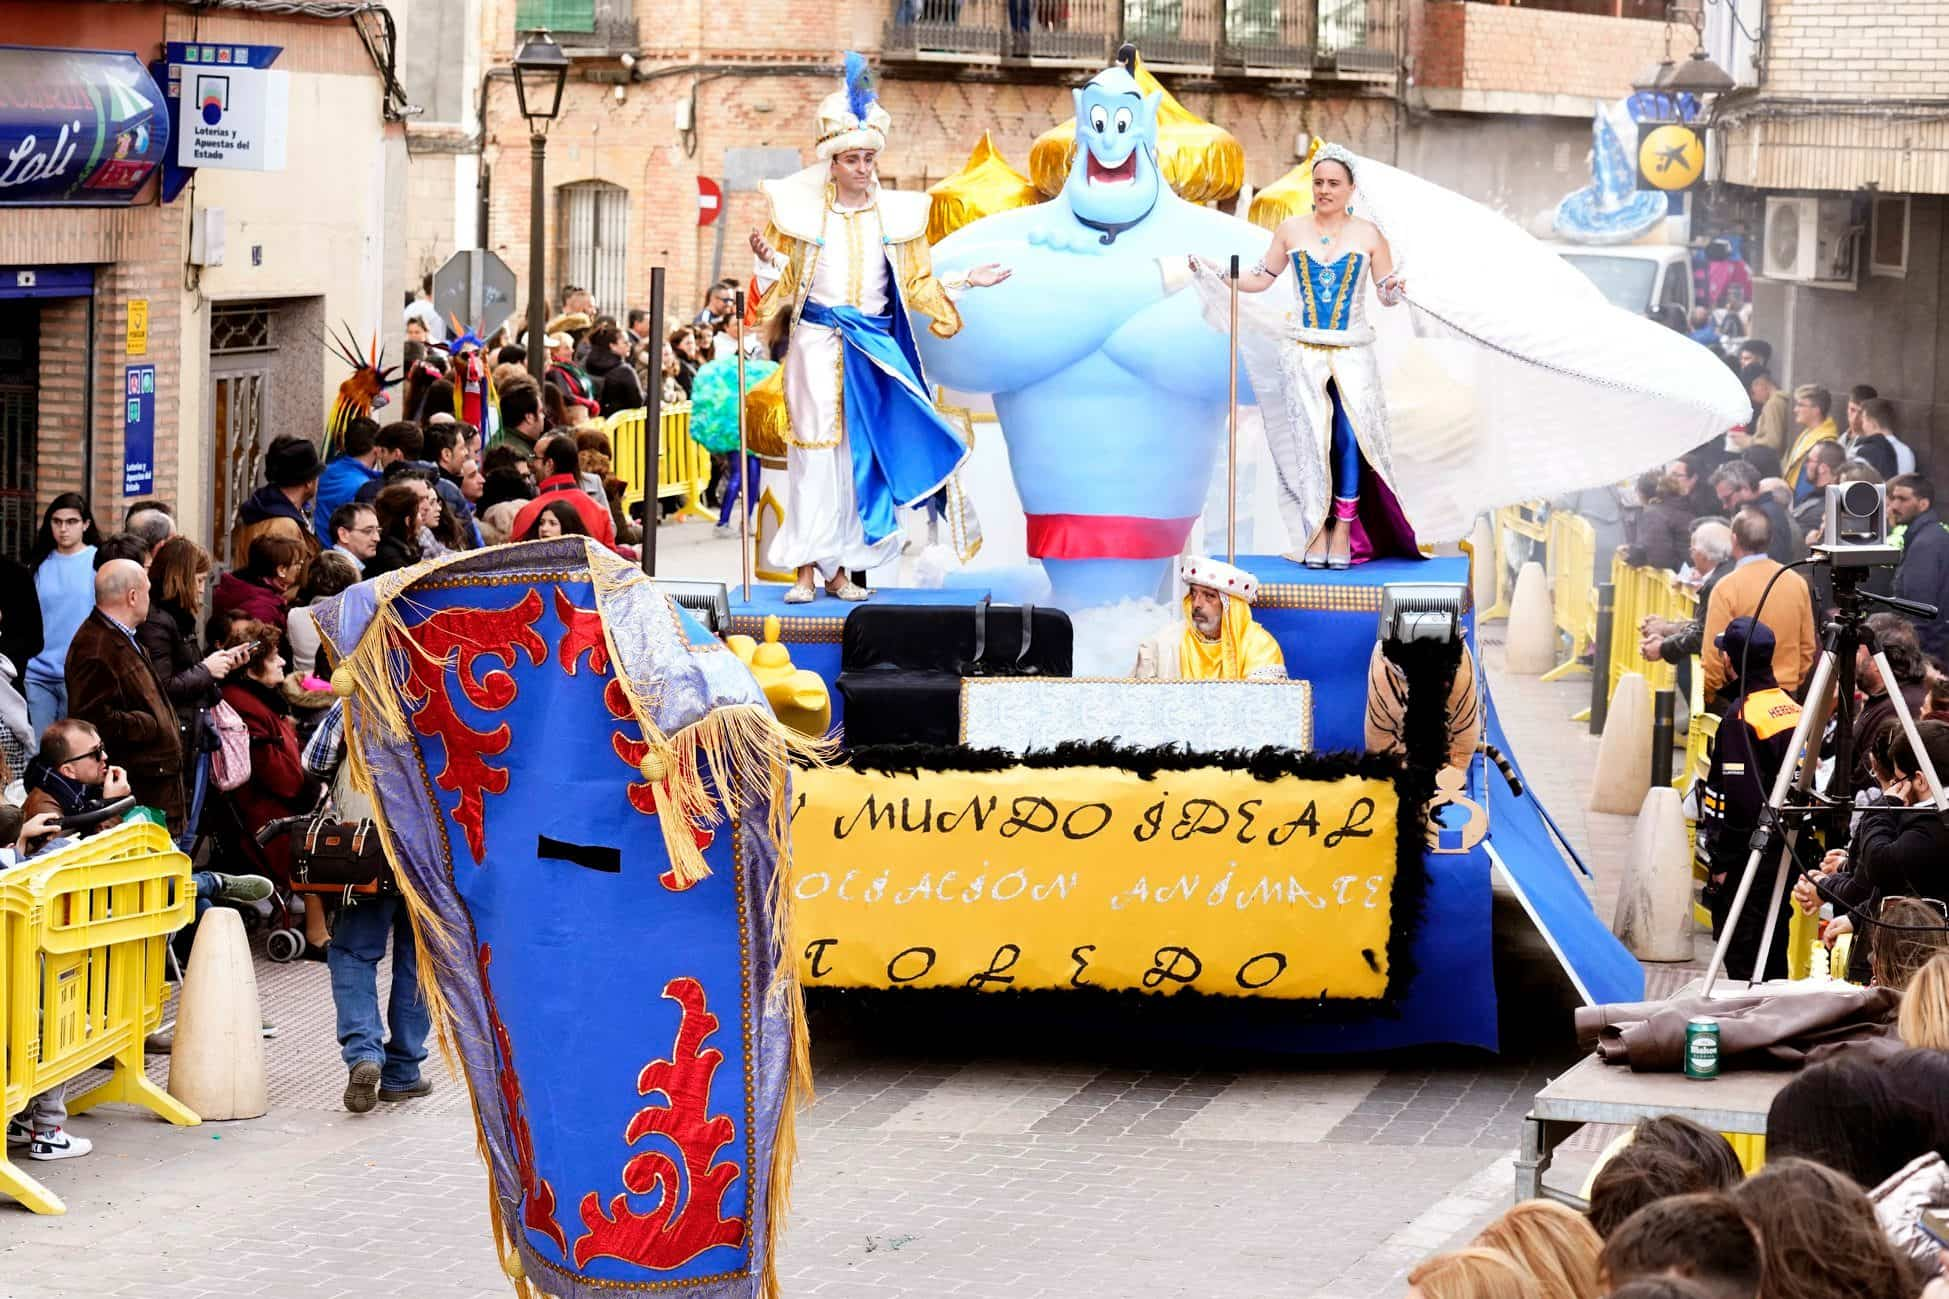 Carnaval de herencia 2020 ofertorio 108 - Selección de fotografías del Ofertorio del Carnaval de Herencia